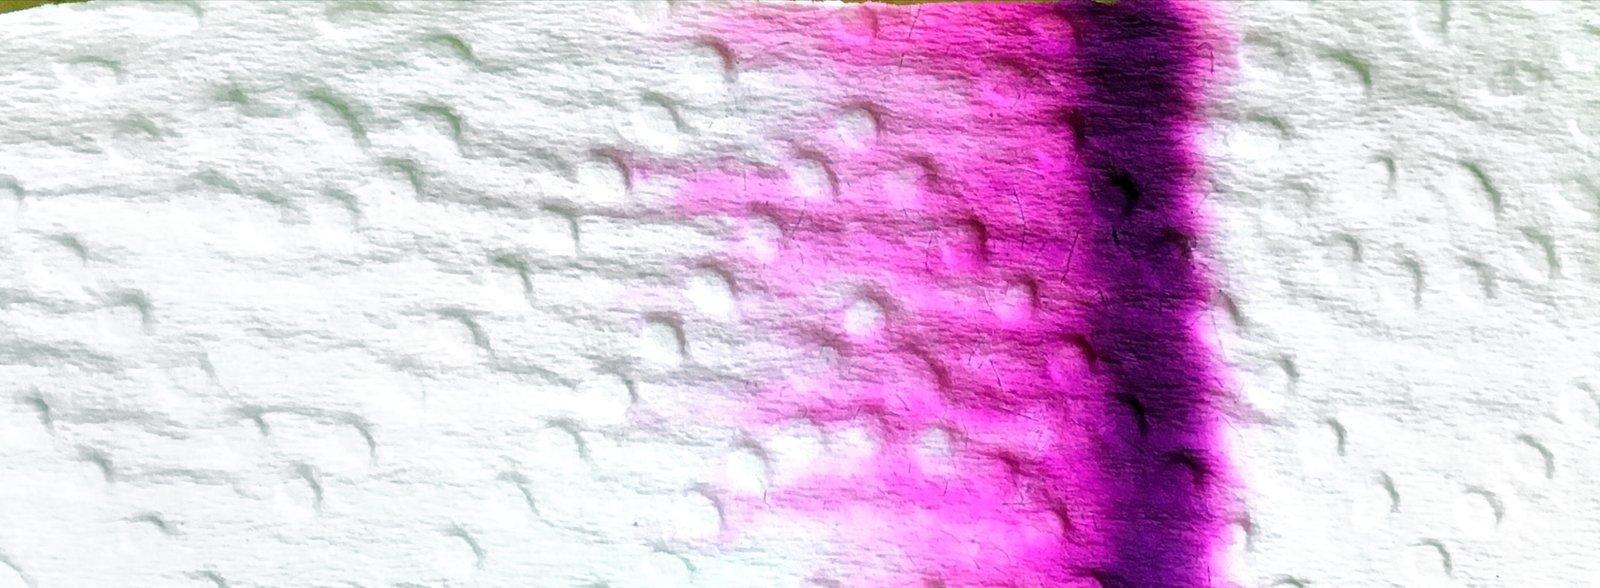 large.59d0ea41f0a20_NoodlersKingPhilipRequiemchromatografia.jpg.e1e38a8315eeec6fd36b1138458fac8c.jpg